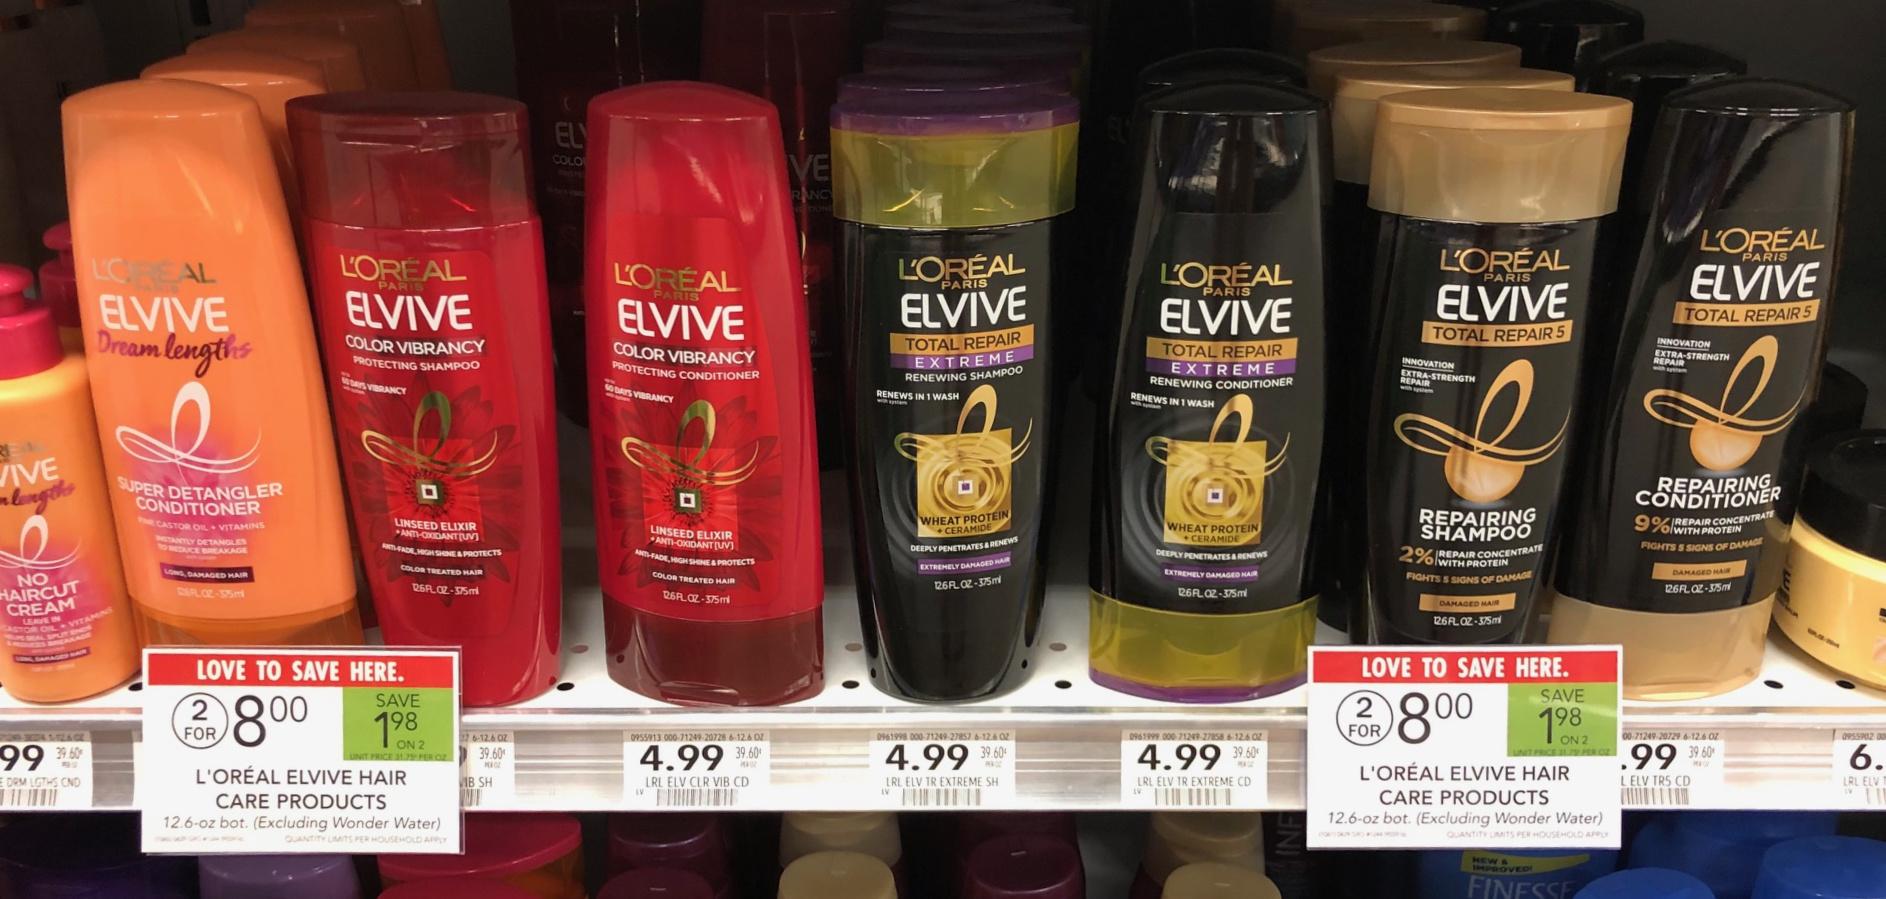 L'Oreal Elvive Haircare Just $2.50 Per Bottle At Publix on I Heart Publix